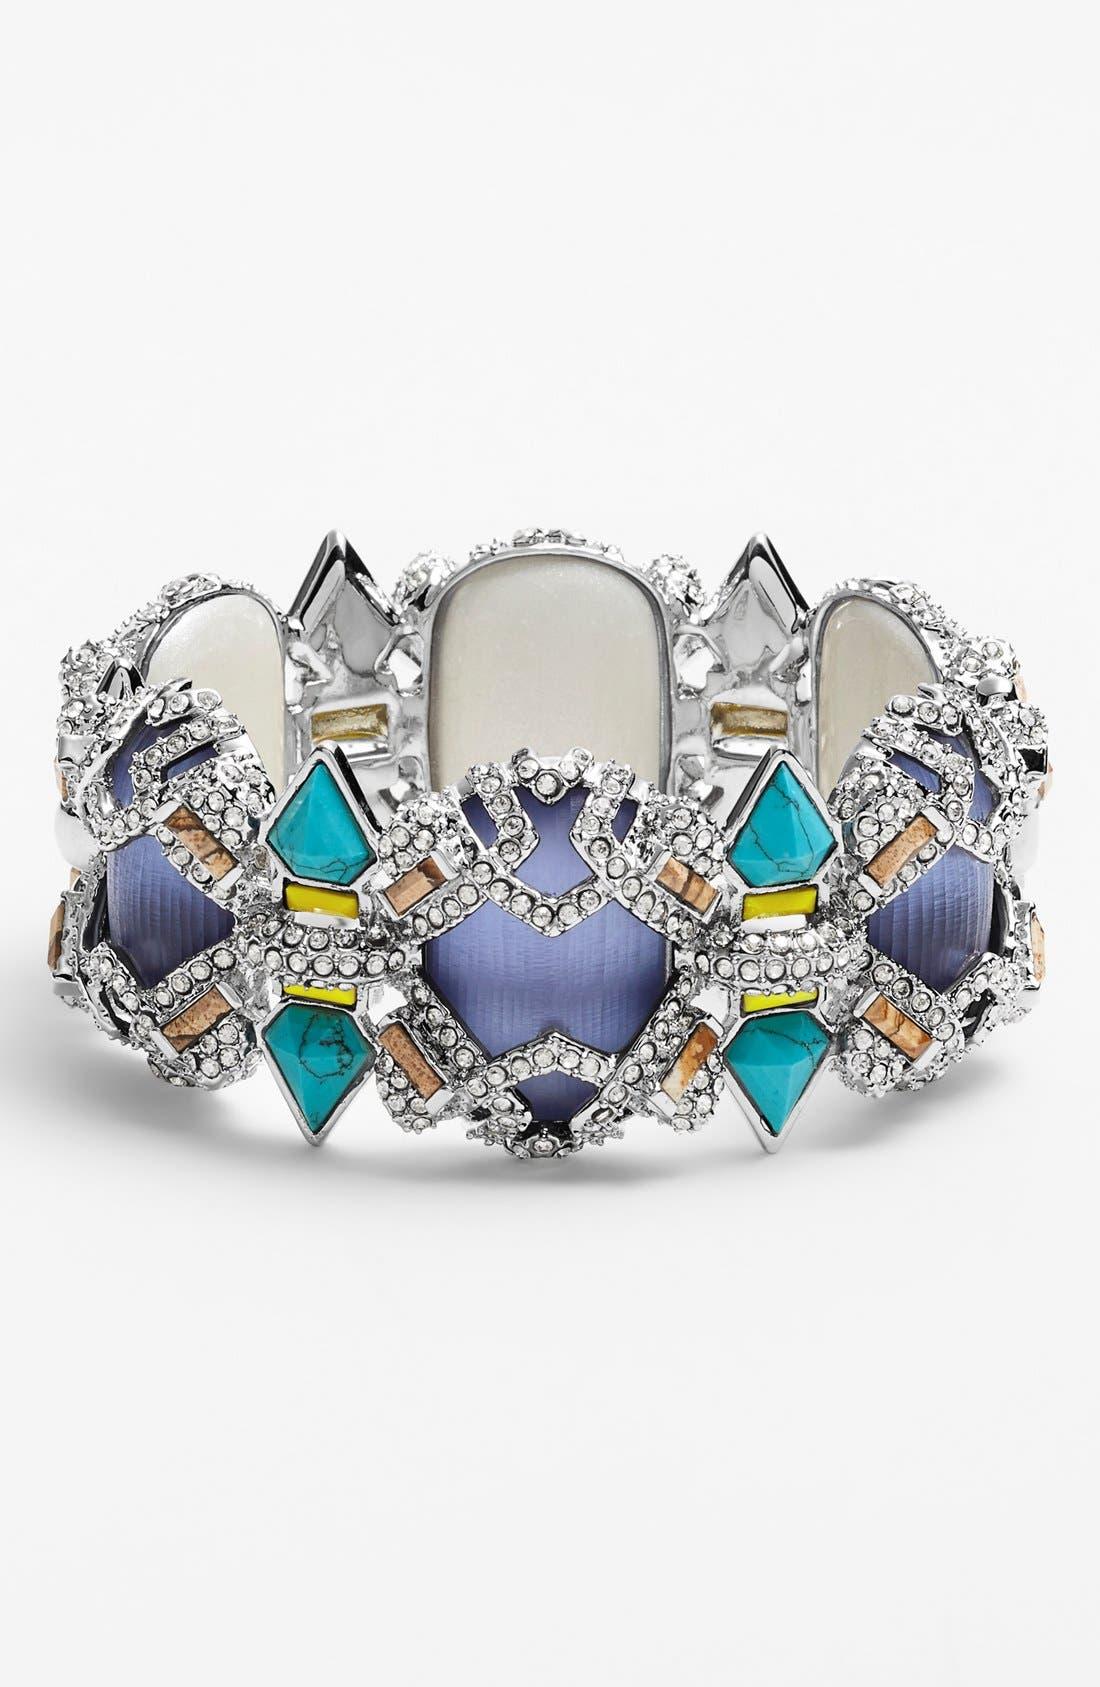 Main Image - Alexis Bittar 'Lucite® - Neon Deco' Wide Bracelet